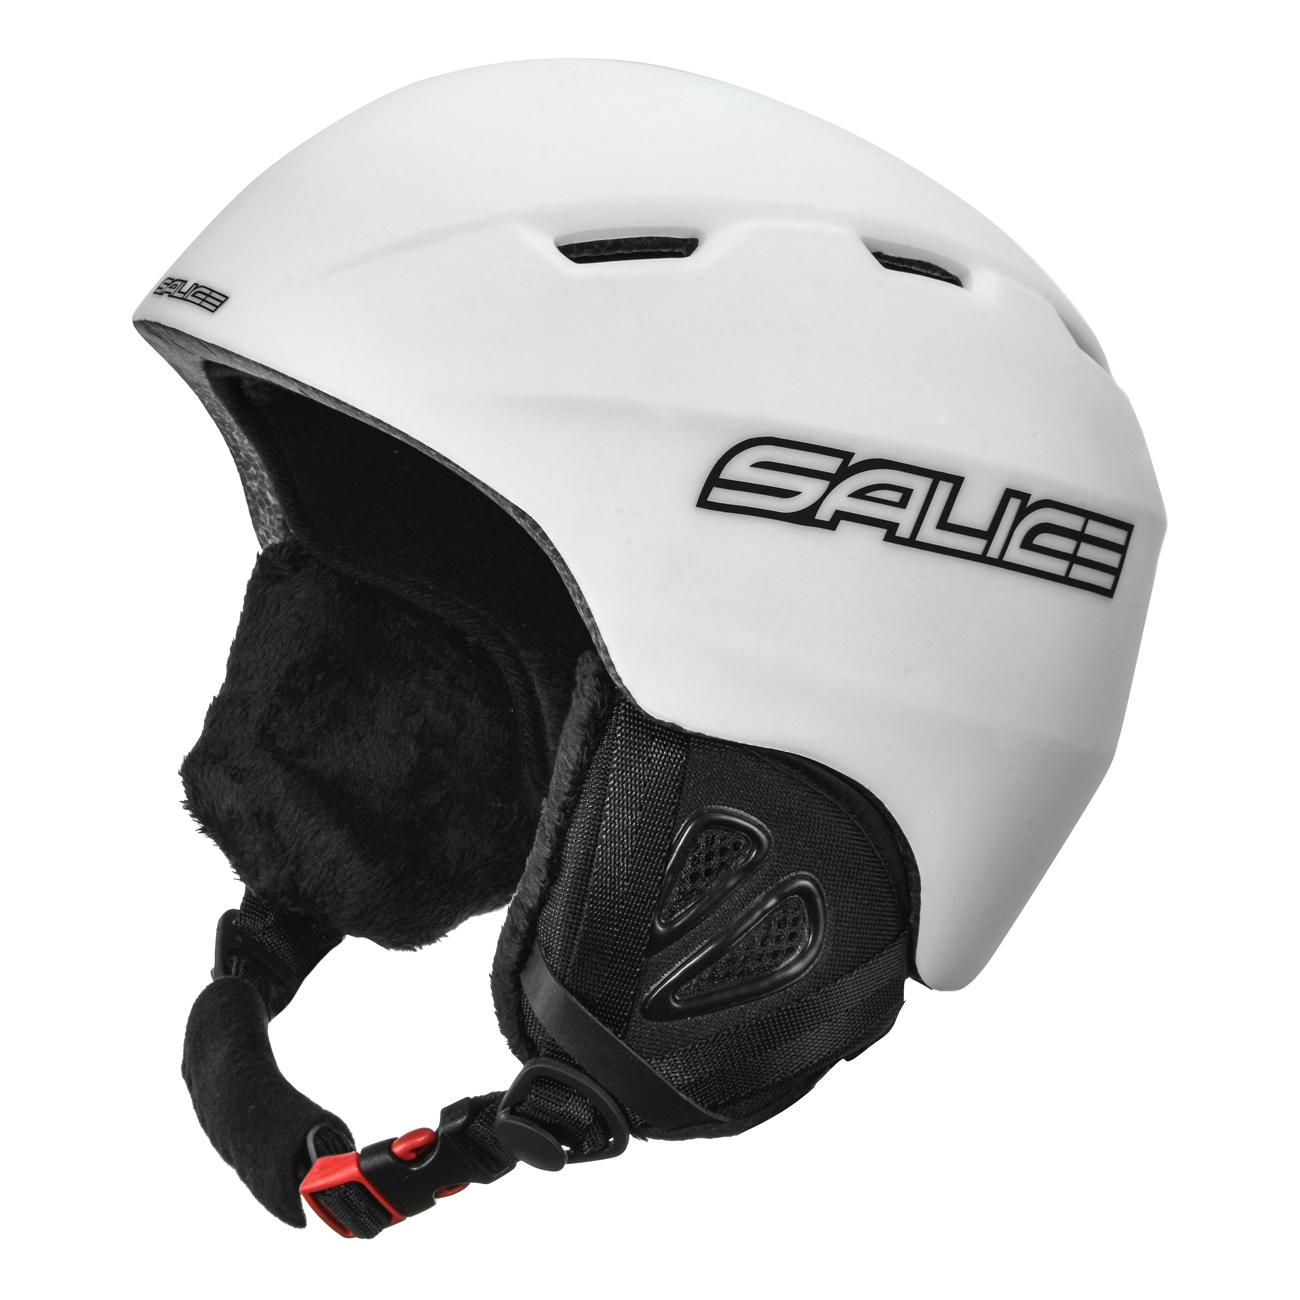 Зимний Шлем Salice 2016-17 LOOP BLACK